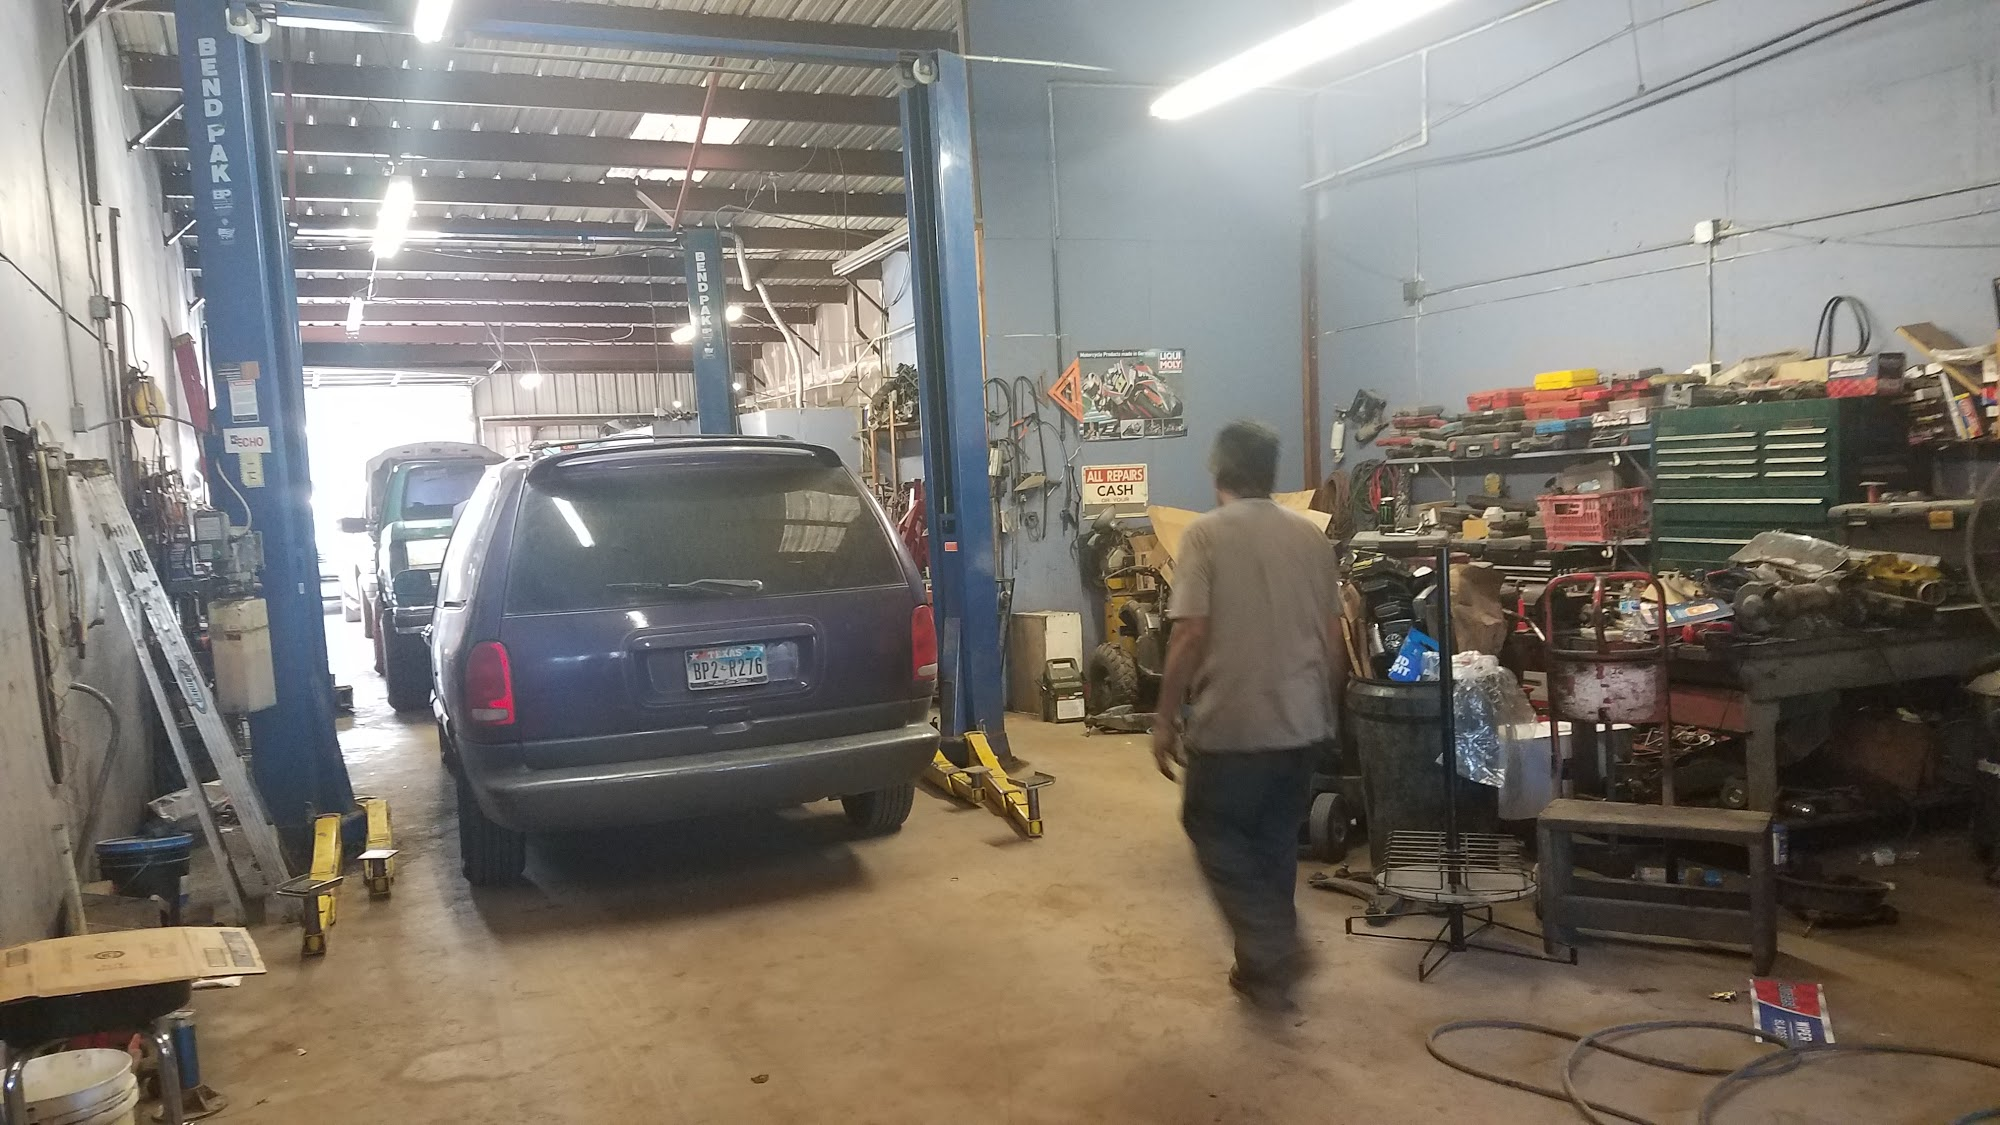 Pancho's Mechanic Shop 6300 W Little York Rd #123, Houston